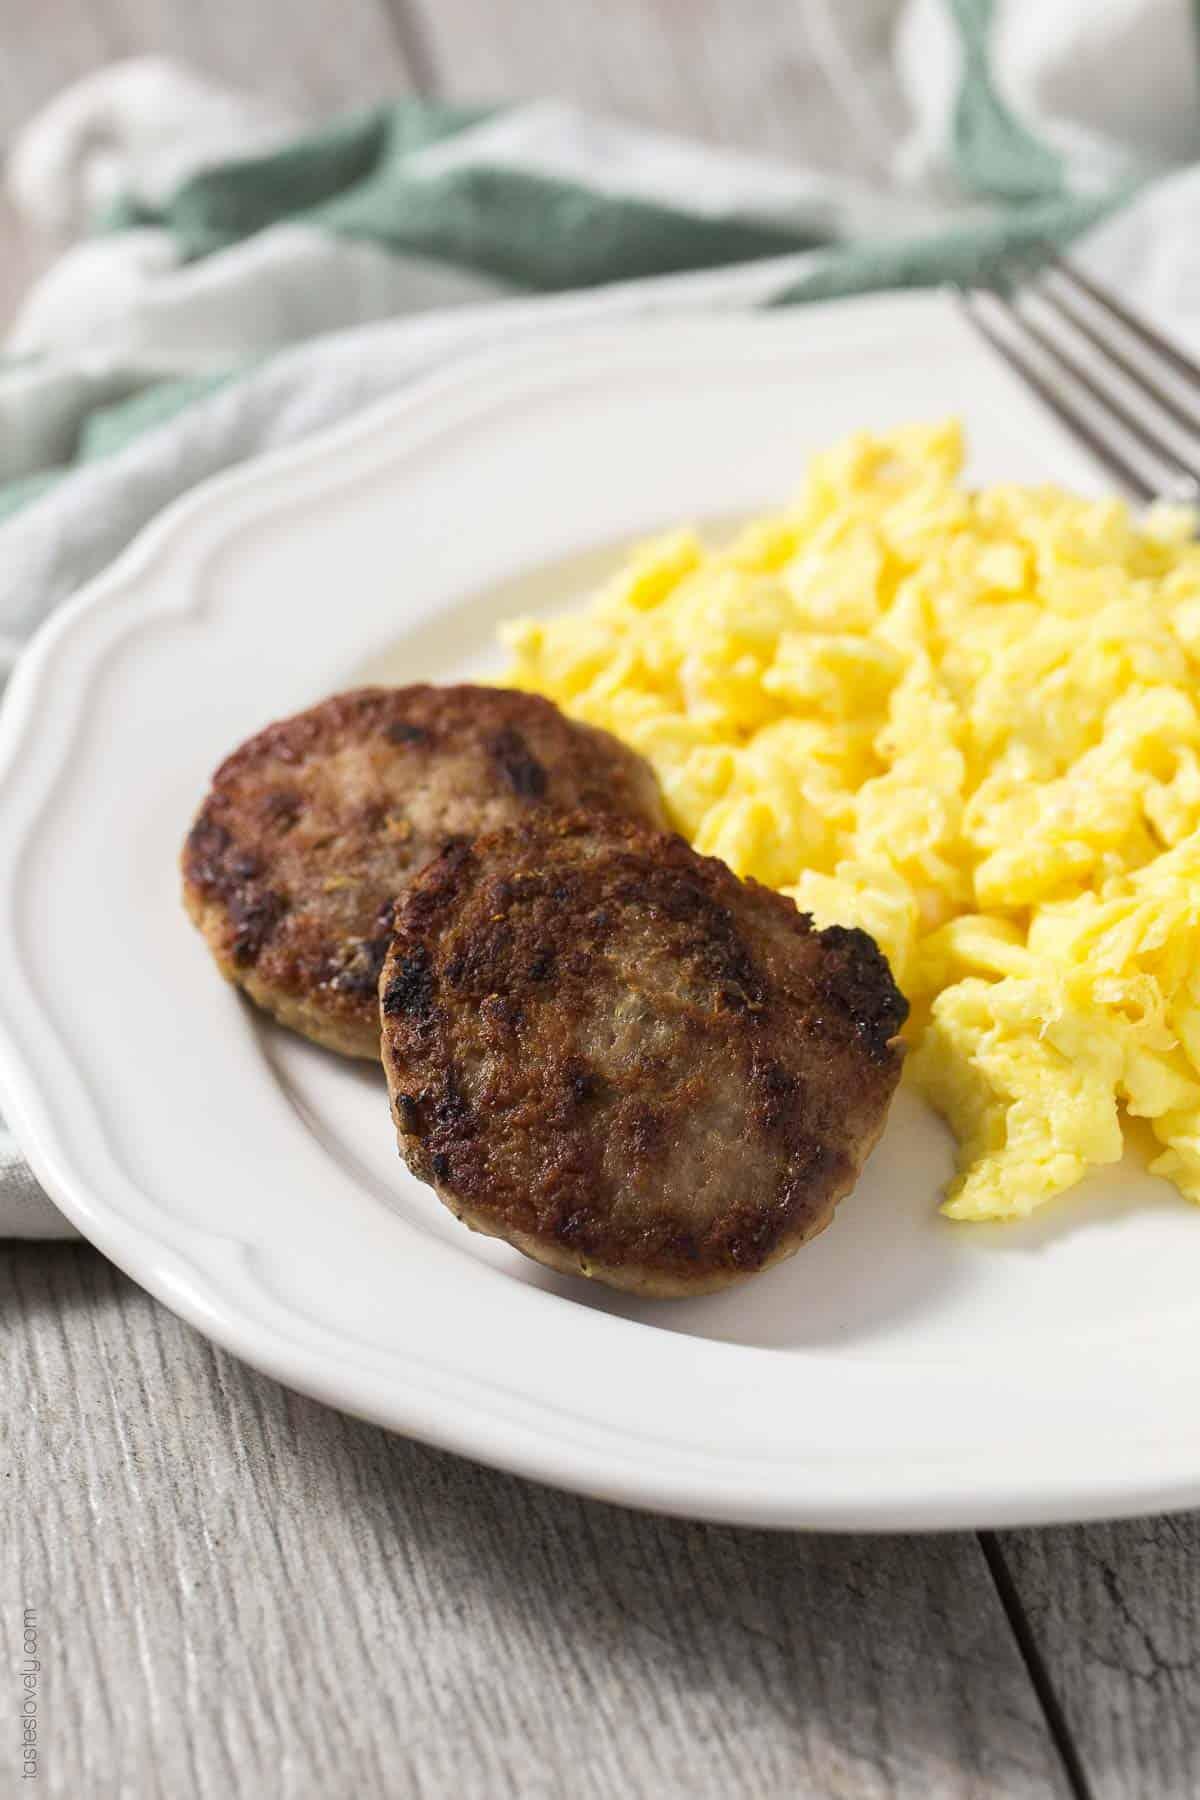 Homemade Paleo Breakfast Sausage Patties